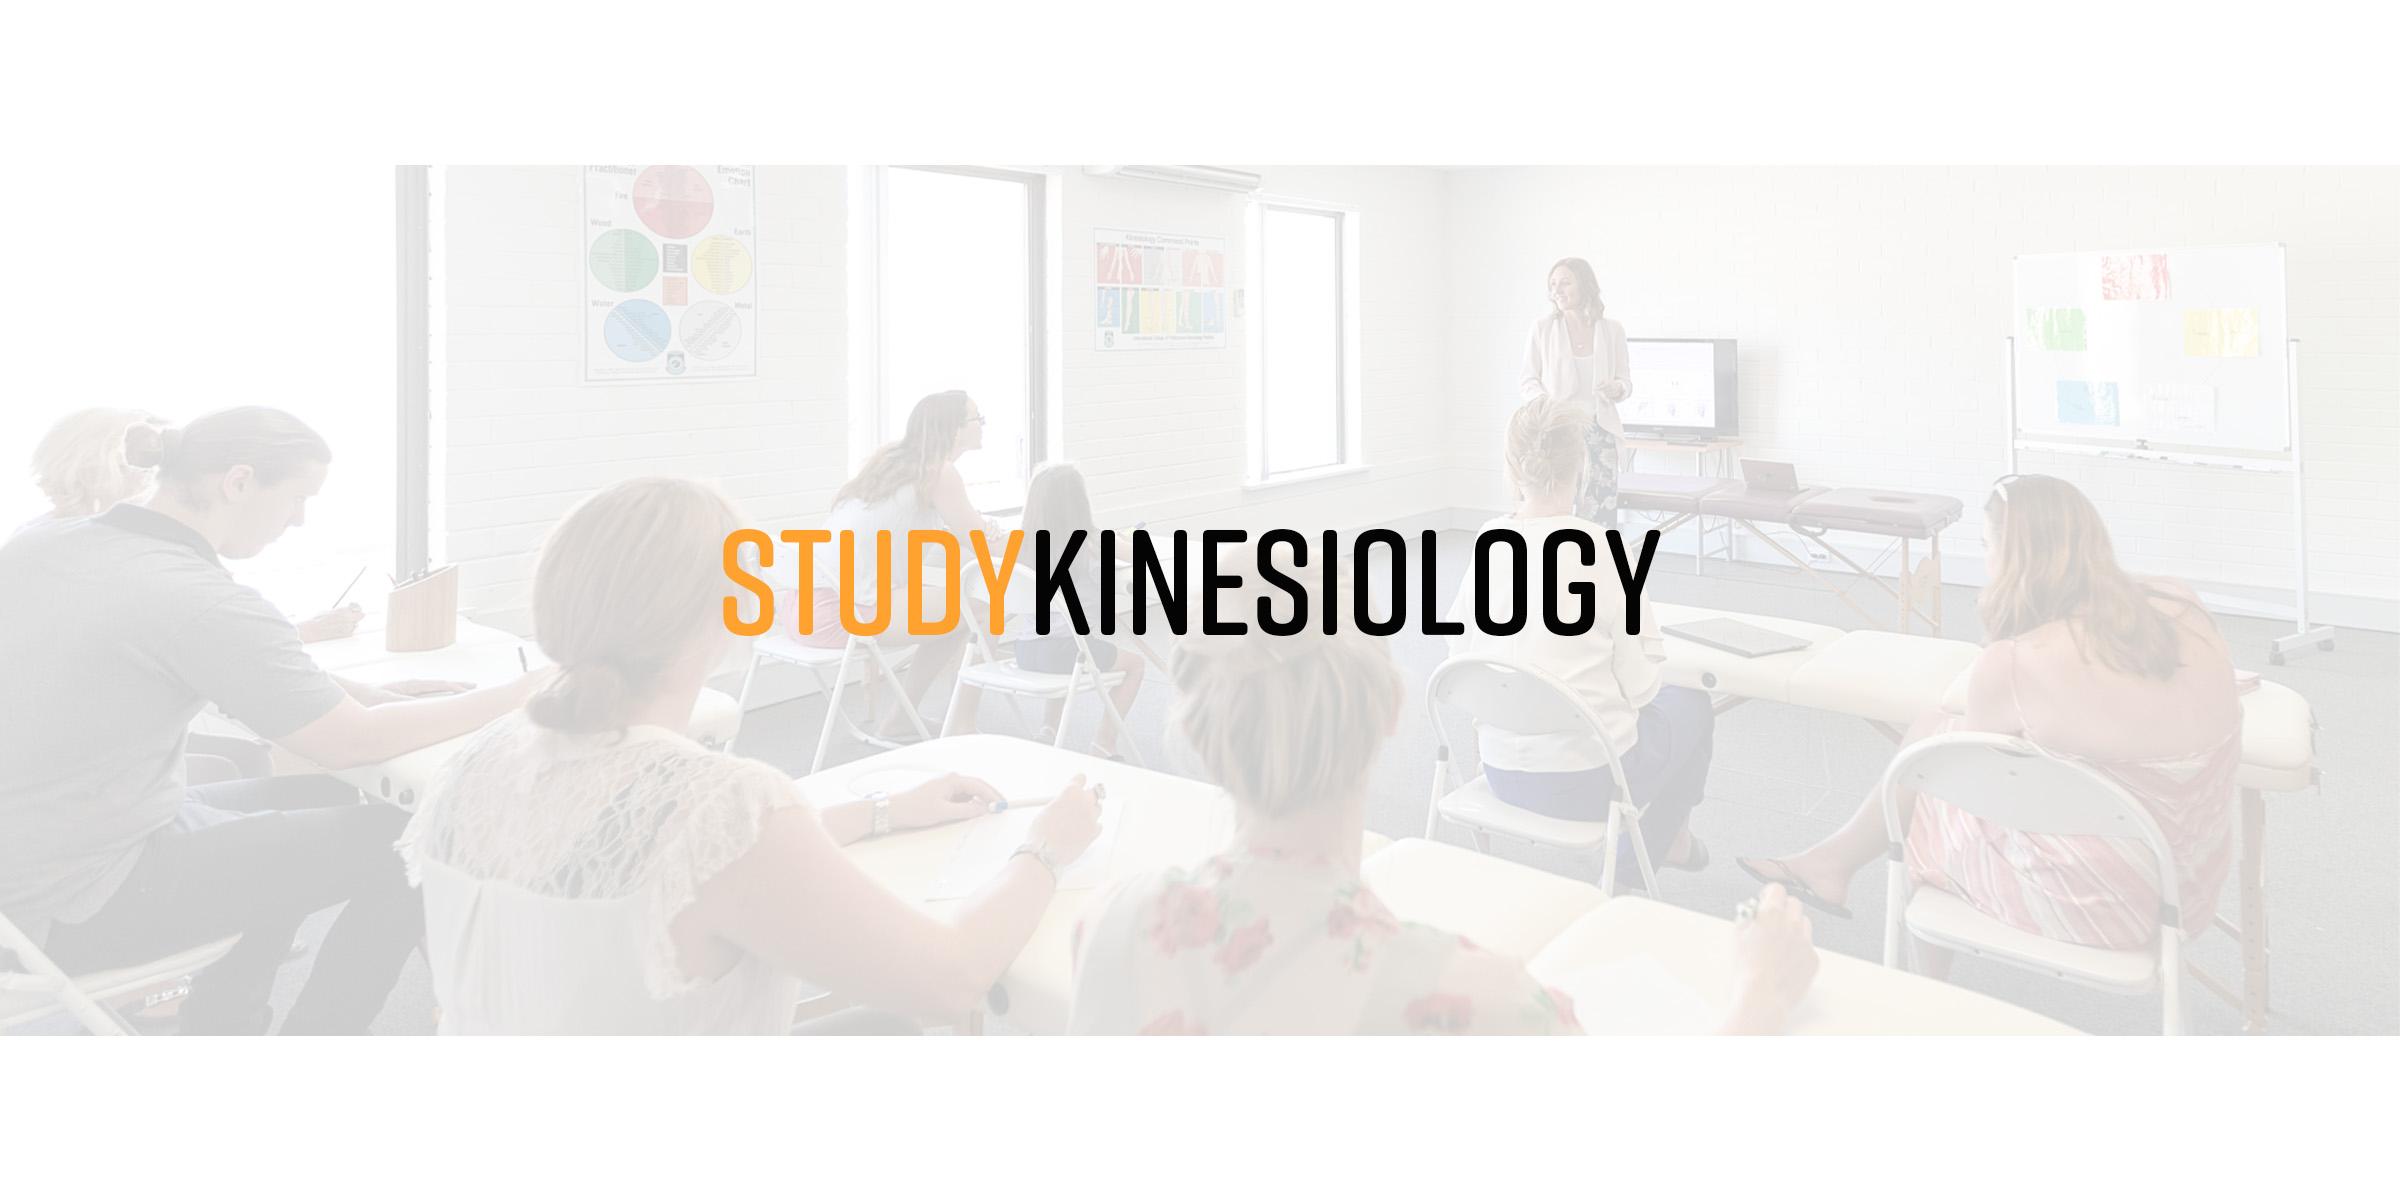 Study Kinesiology